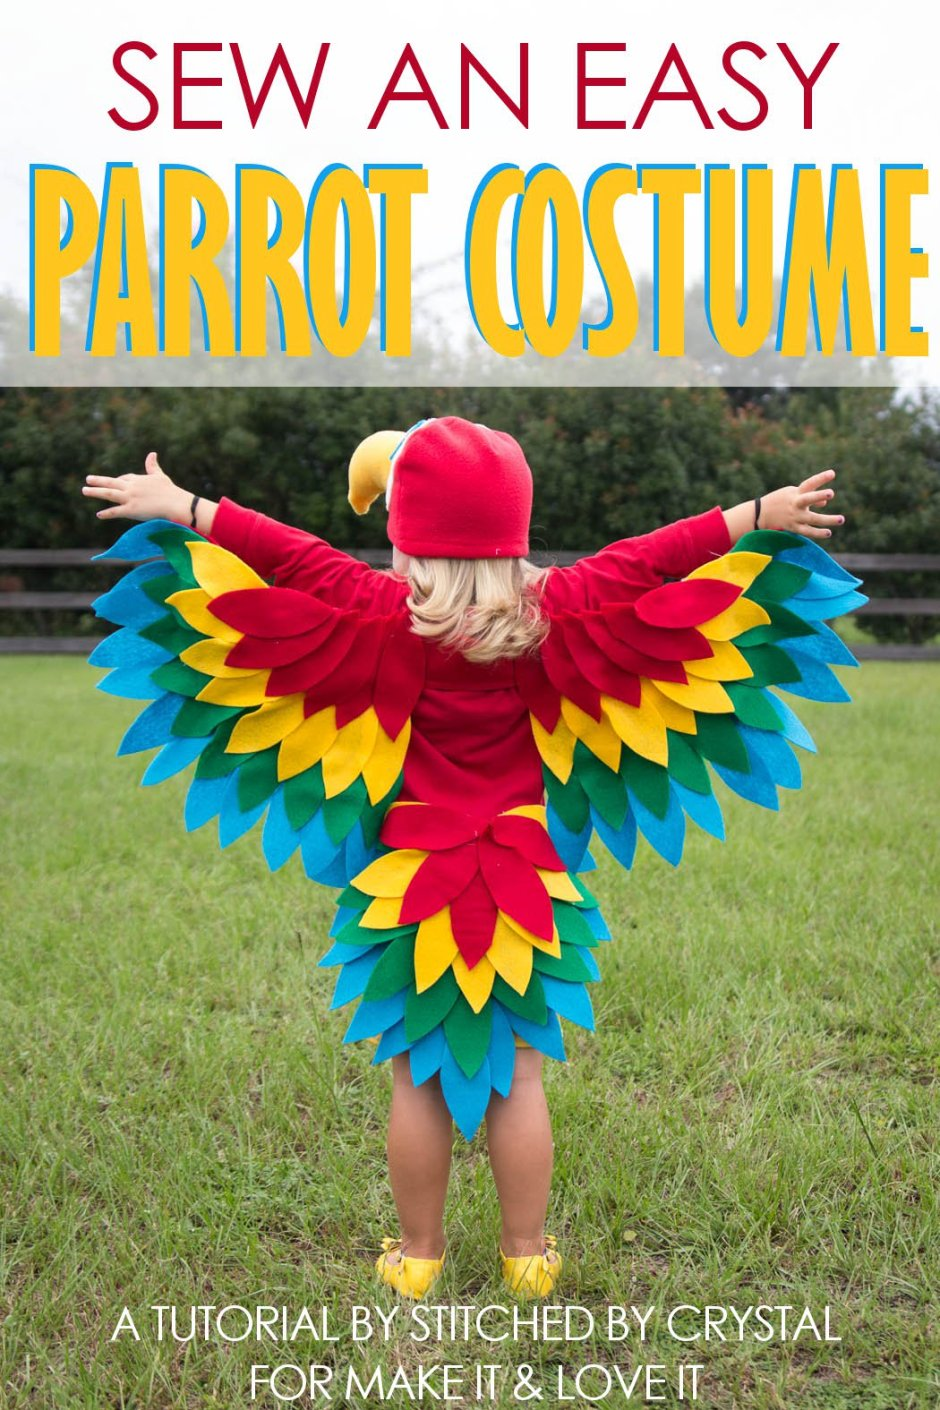 parrot-costume-71